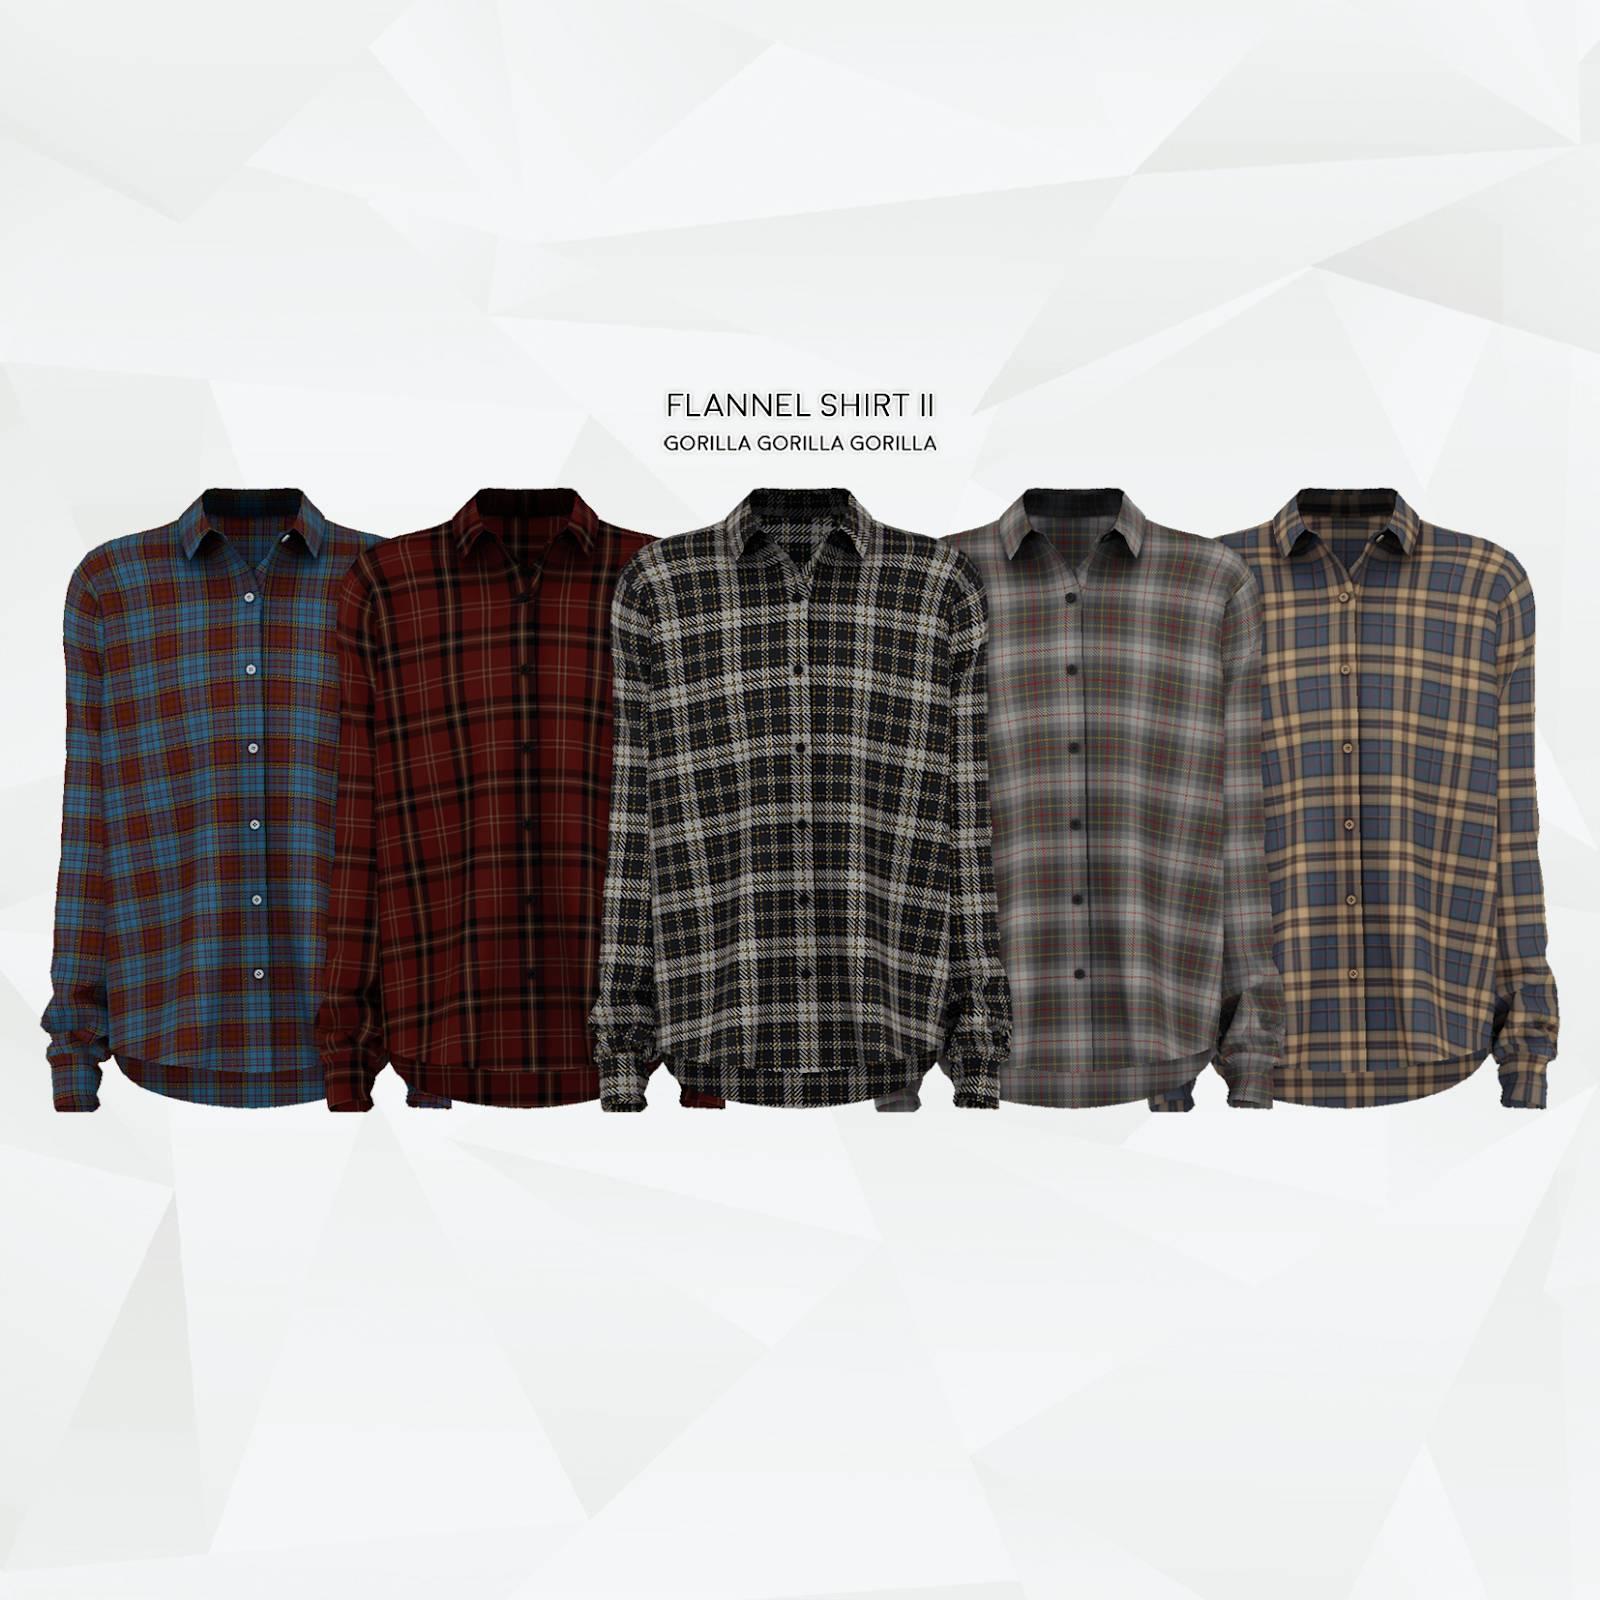 Мужская рубашка - Flannel Shirt II